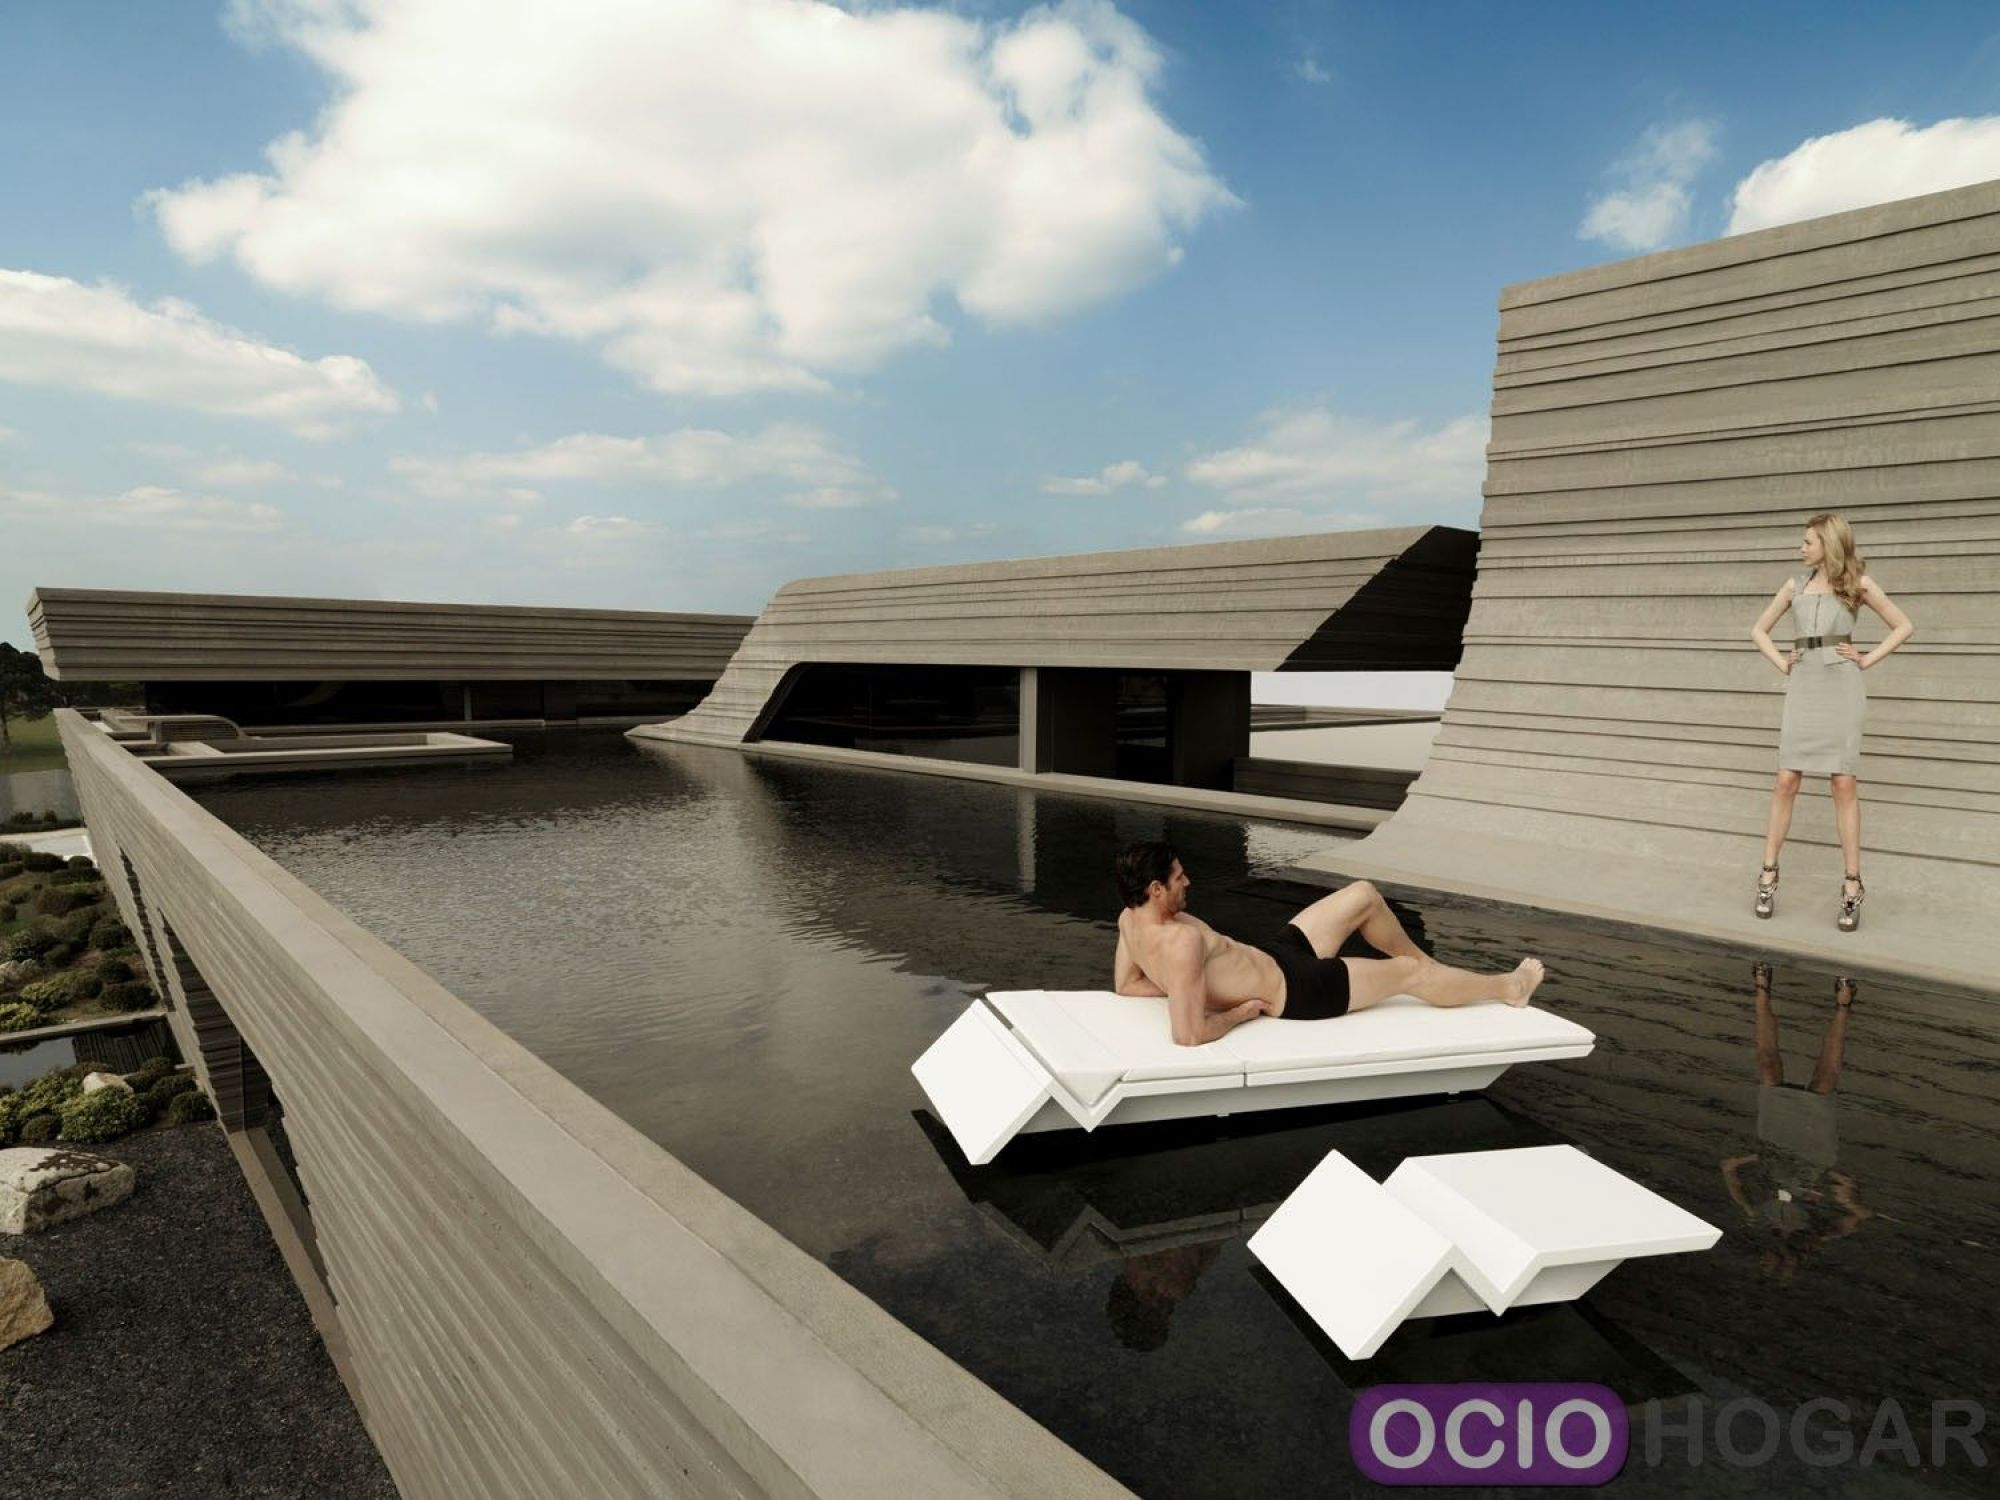 Mesa para tumbona rest de vondom for Casas prefabricadas de diseno joaquin torres